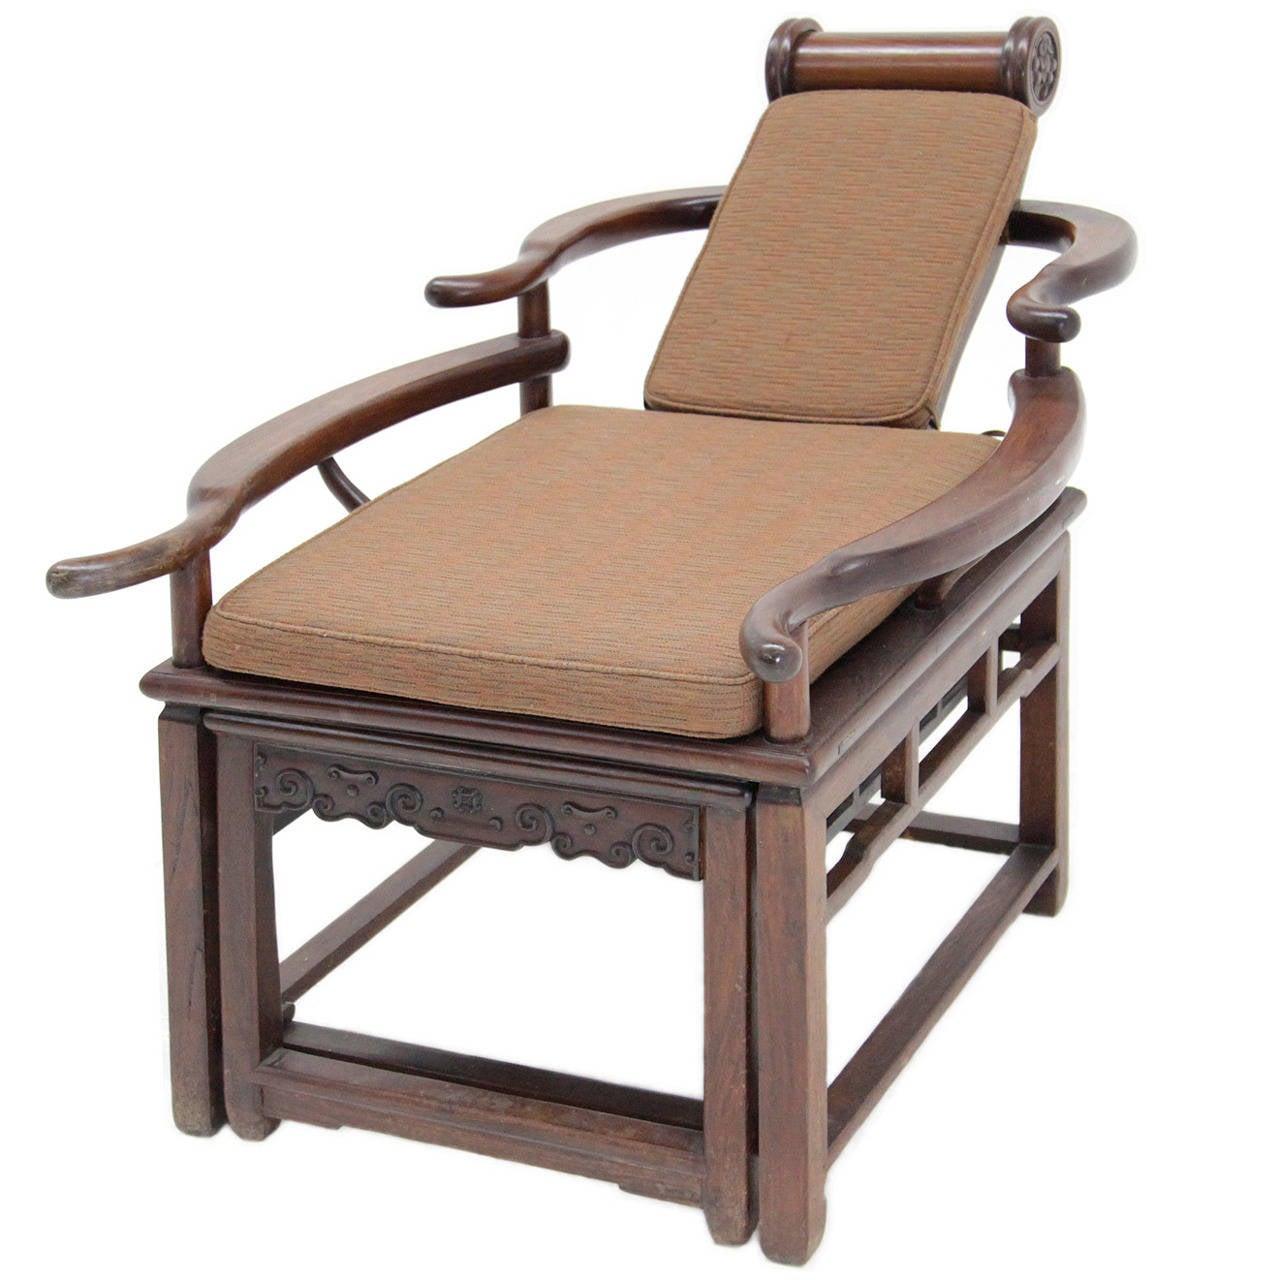 Stupendous Exceptional Asian Recliner Or Deck Chair Circa 1900 1910 Creativecarmelina Interior Chair Design Creativecarmelinacom